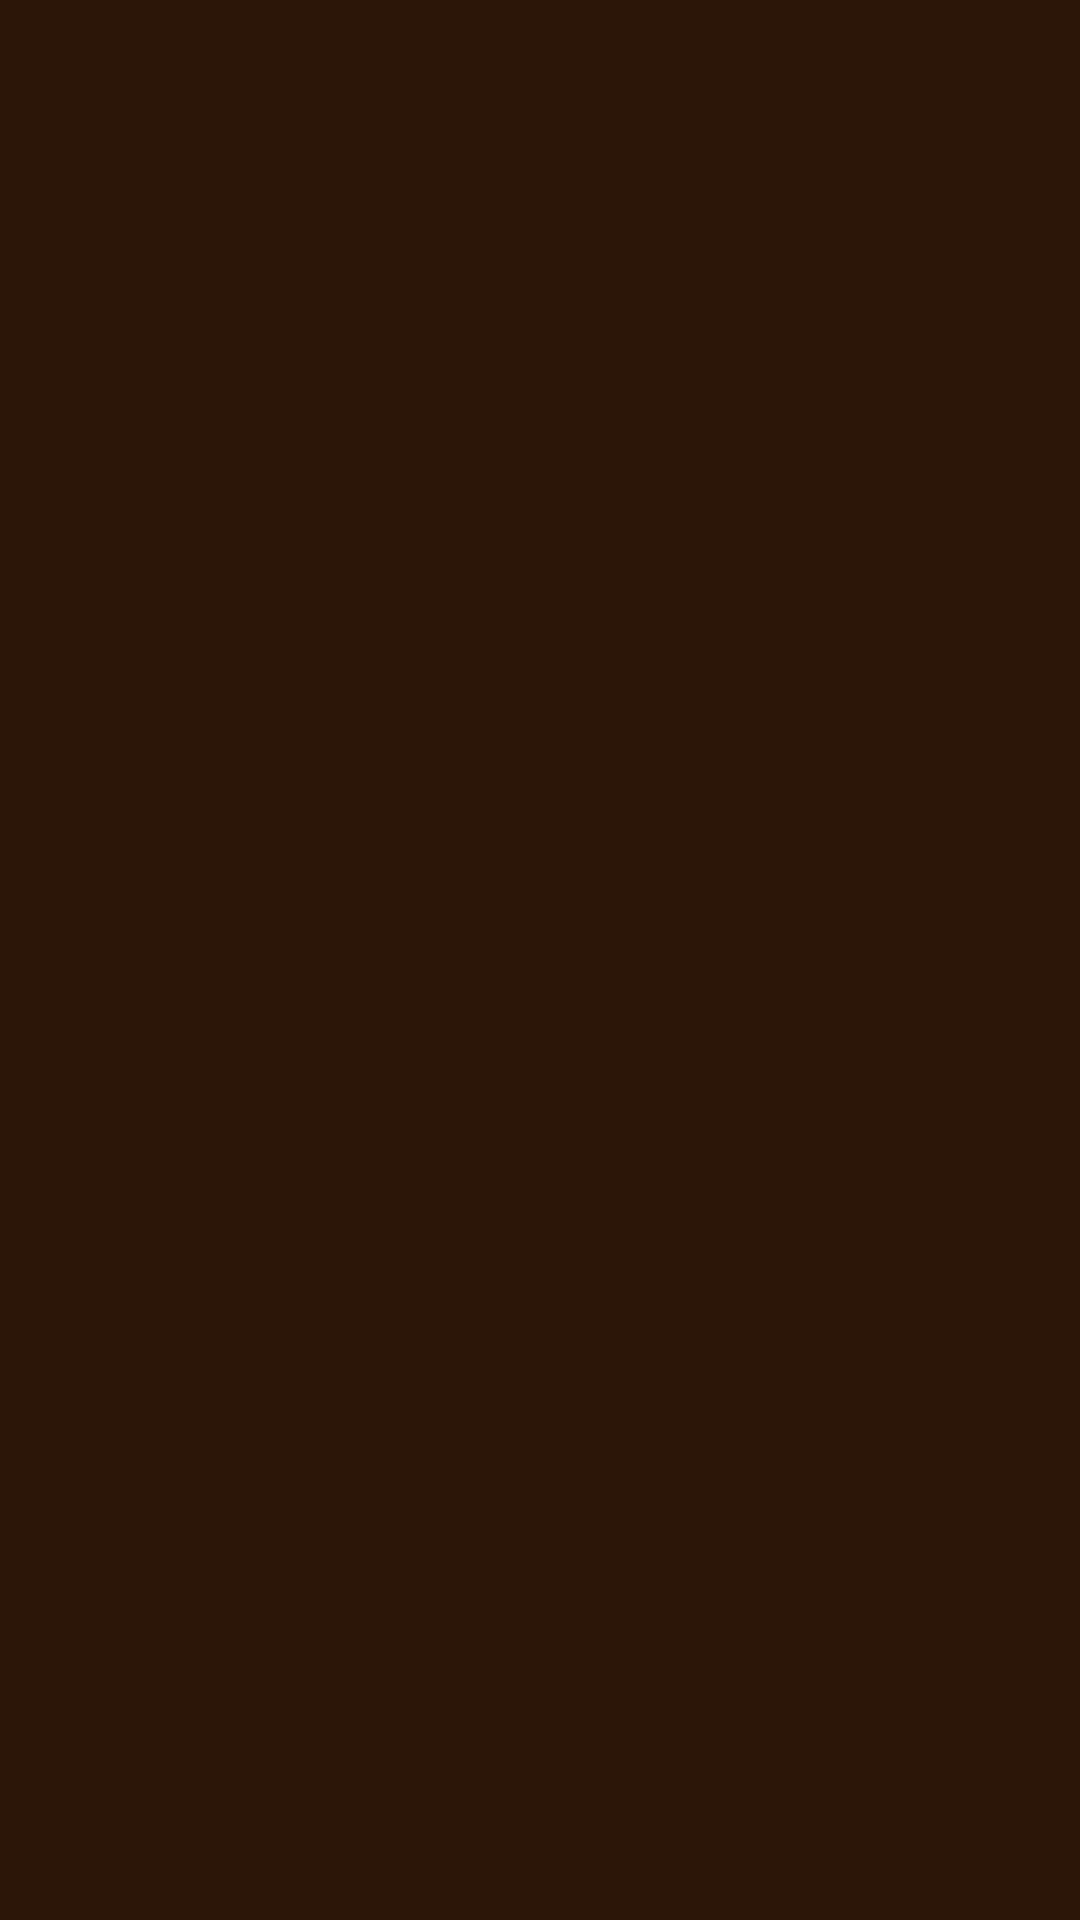 1080x1920 Zinnwaldite Brown Solid Color Background